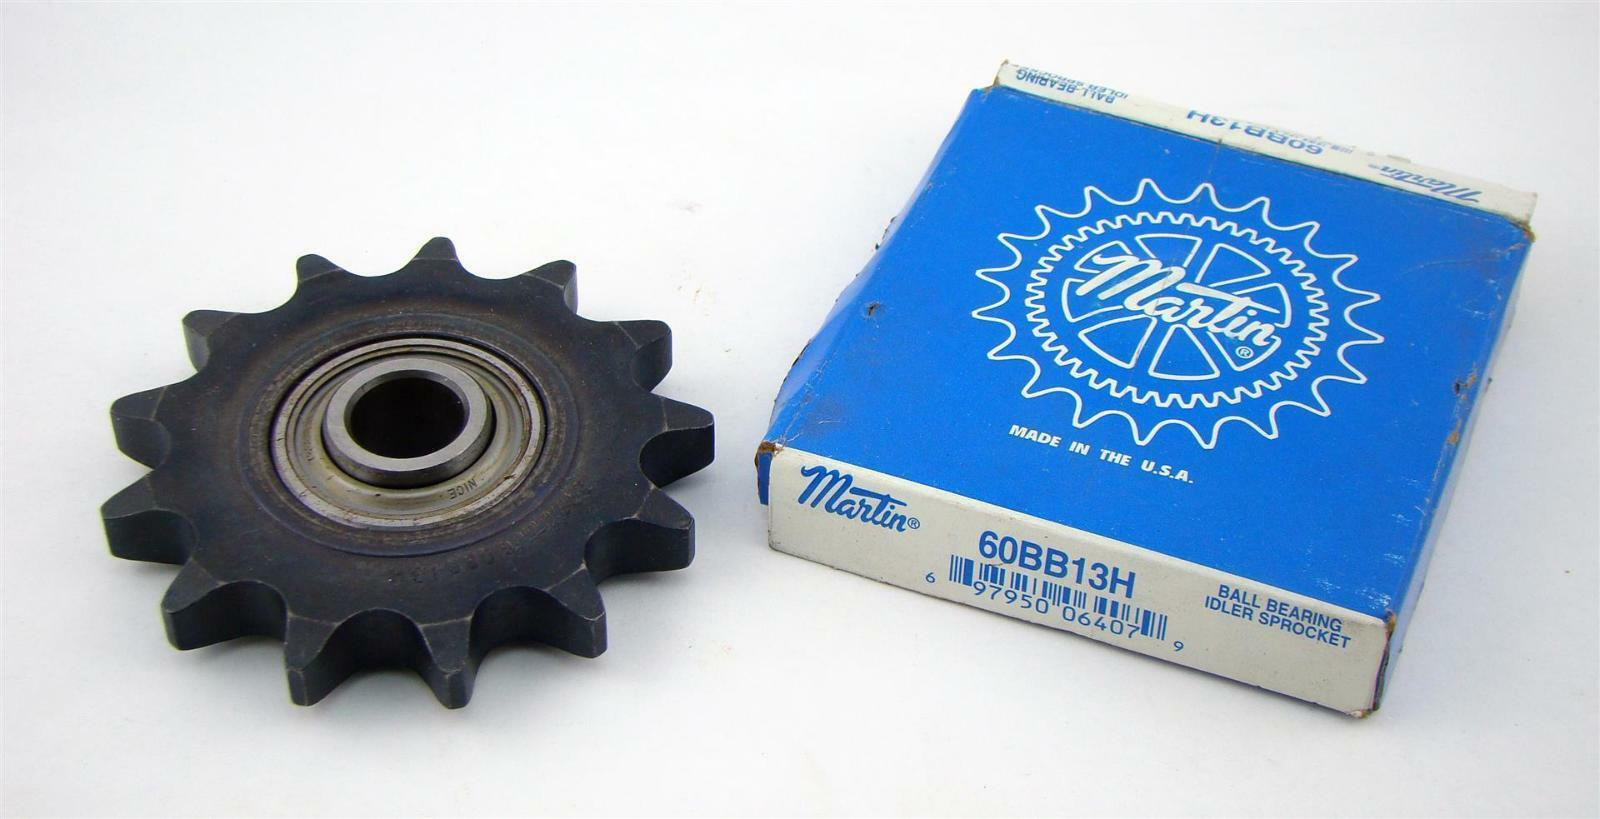 POWER DRIVE HB60A13X5//8 Idler Sprocket,Ball ANSI 60